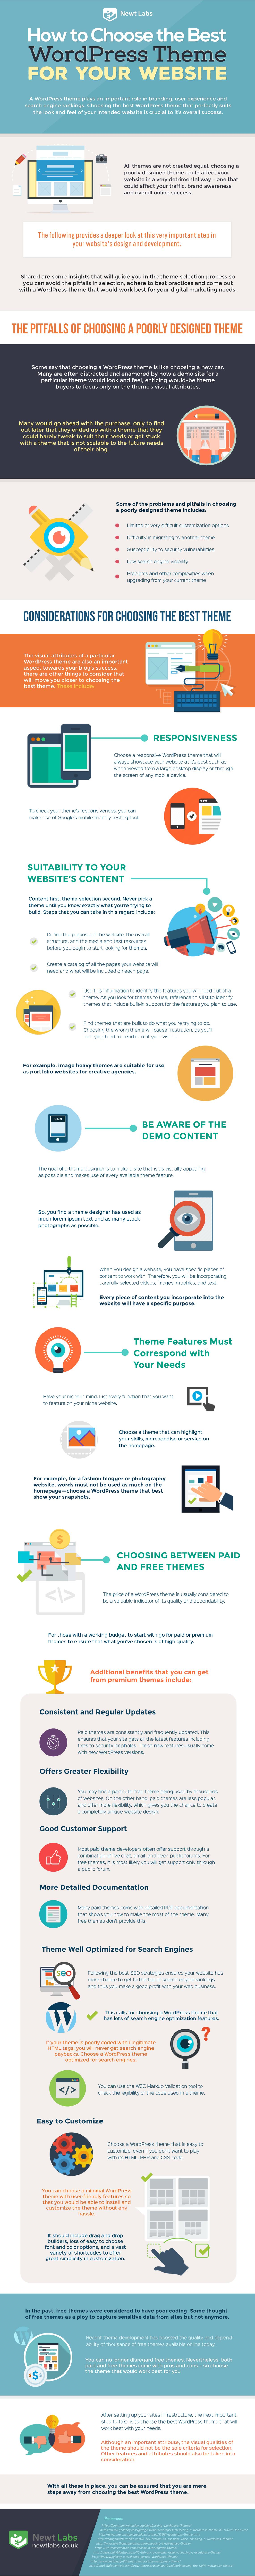 Choosing the best wordpress theme infographic